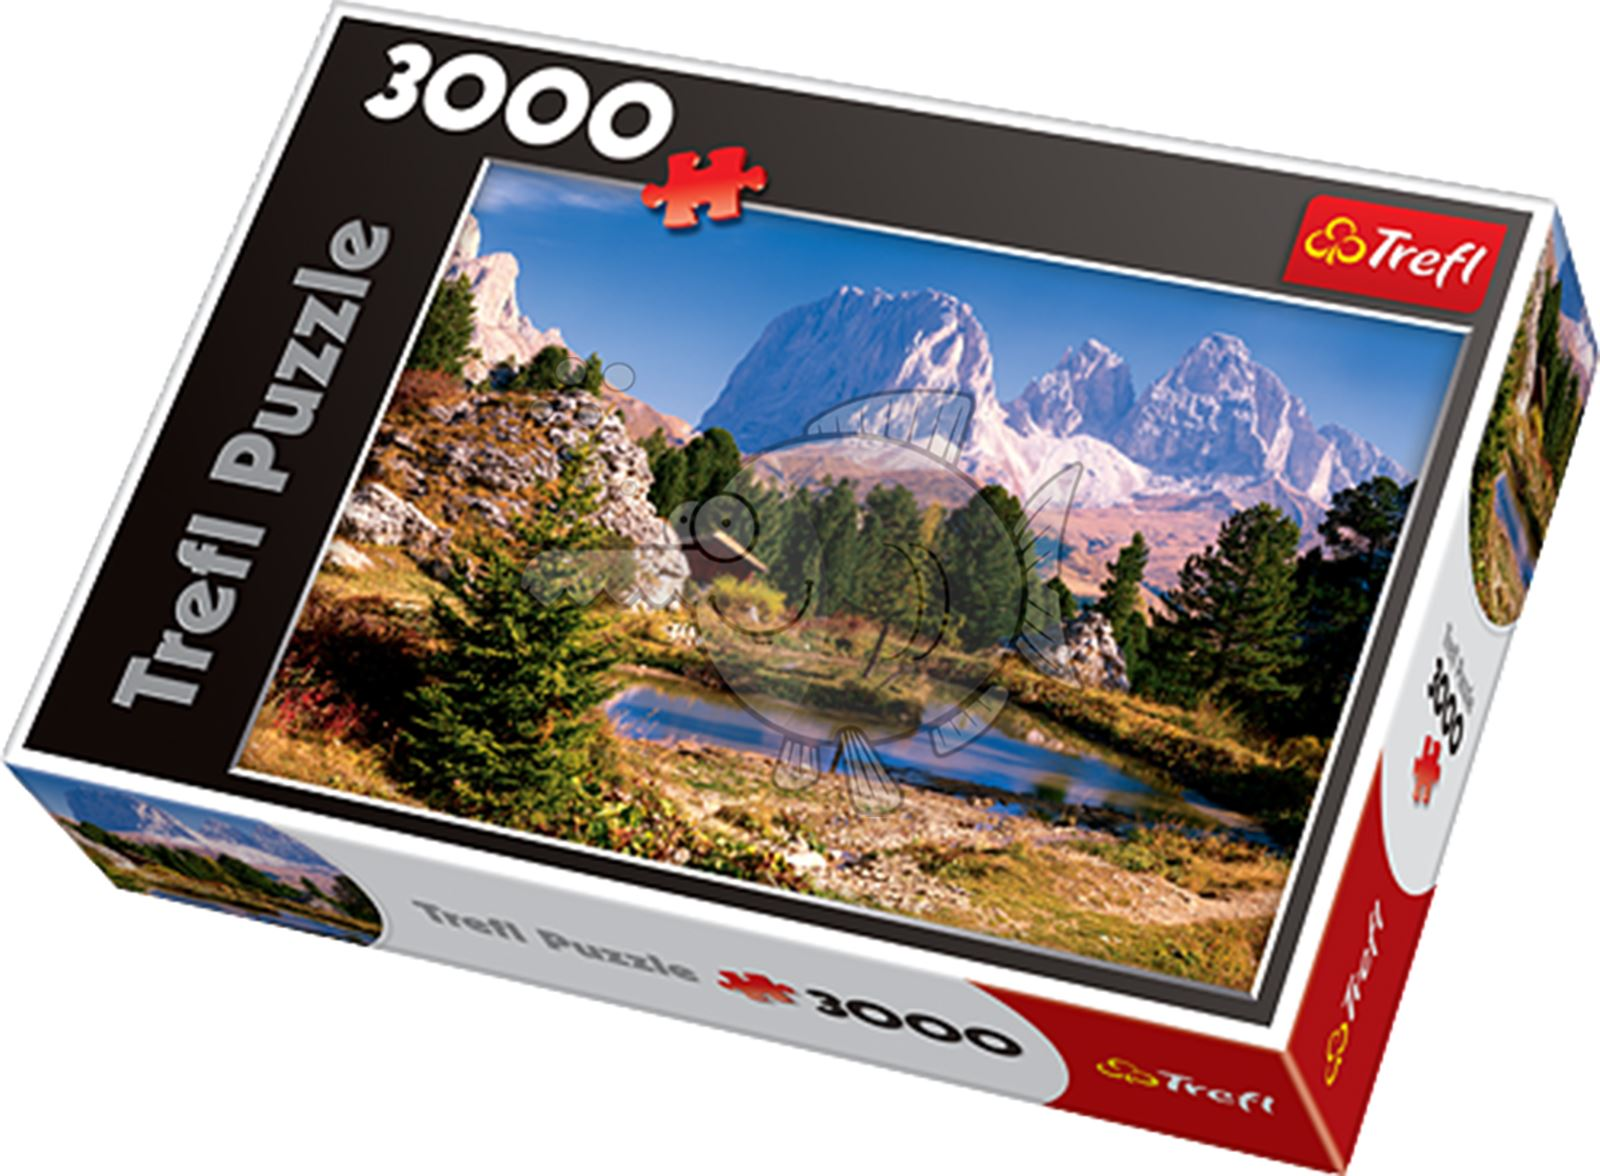 Trefl-300-500-1000-1500-2000-3000-4000-6000-Piece-Jigsaw-Puzzle-Landscapes-City thumbnail 3